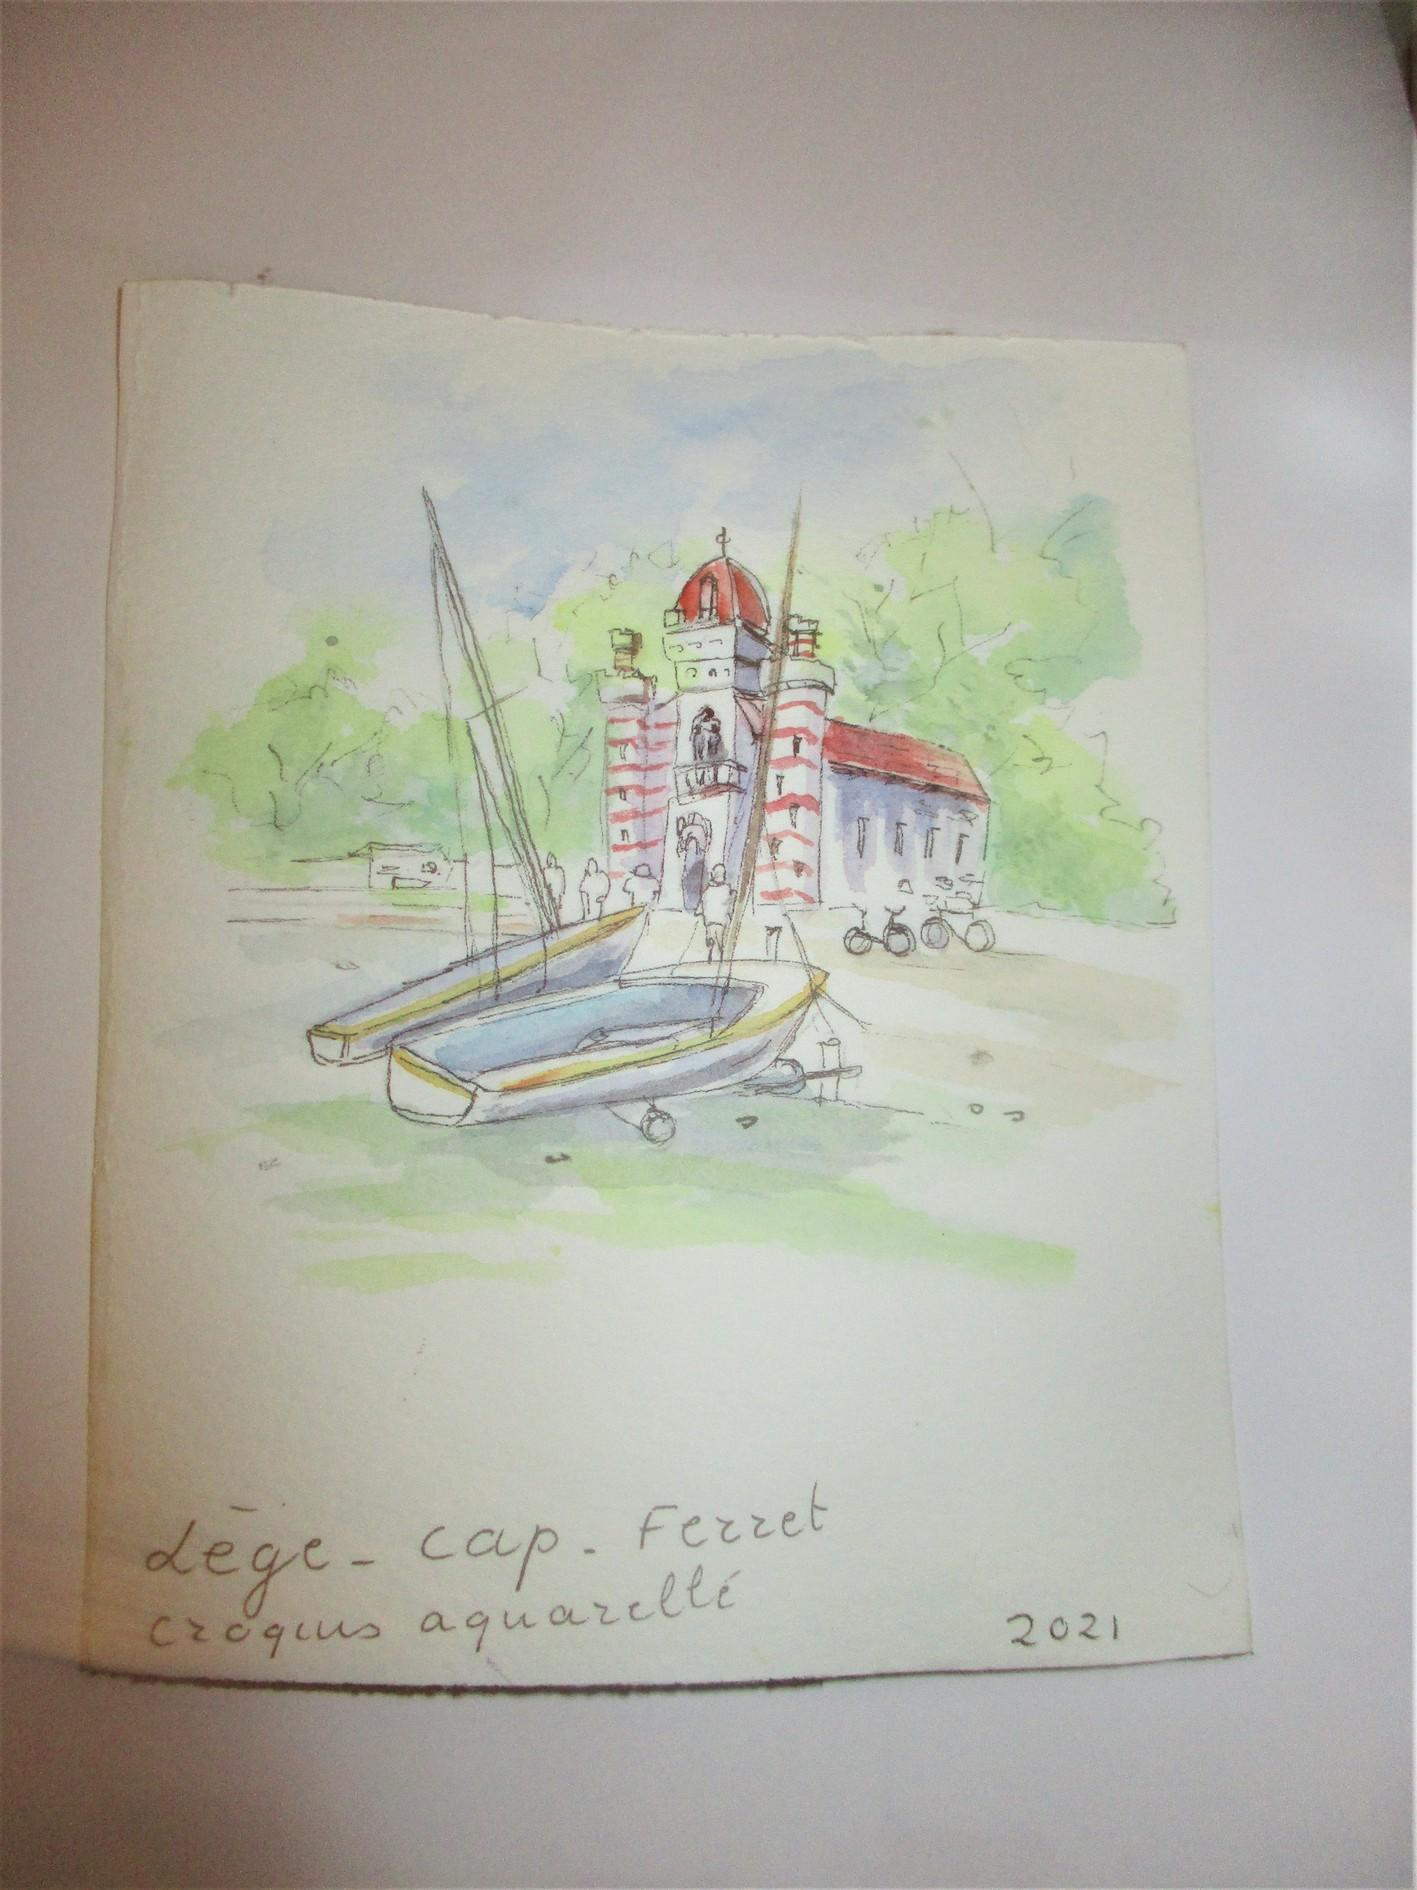 croquis aquarelleCAP FERRET DEVOIR ENVOI A FM Copie